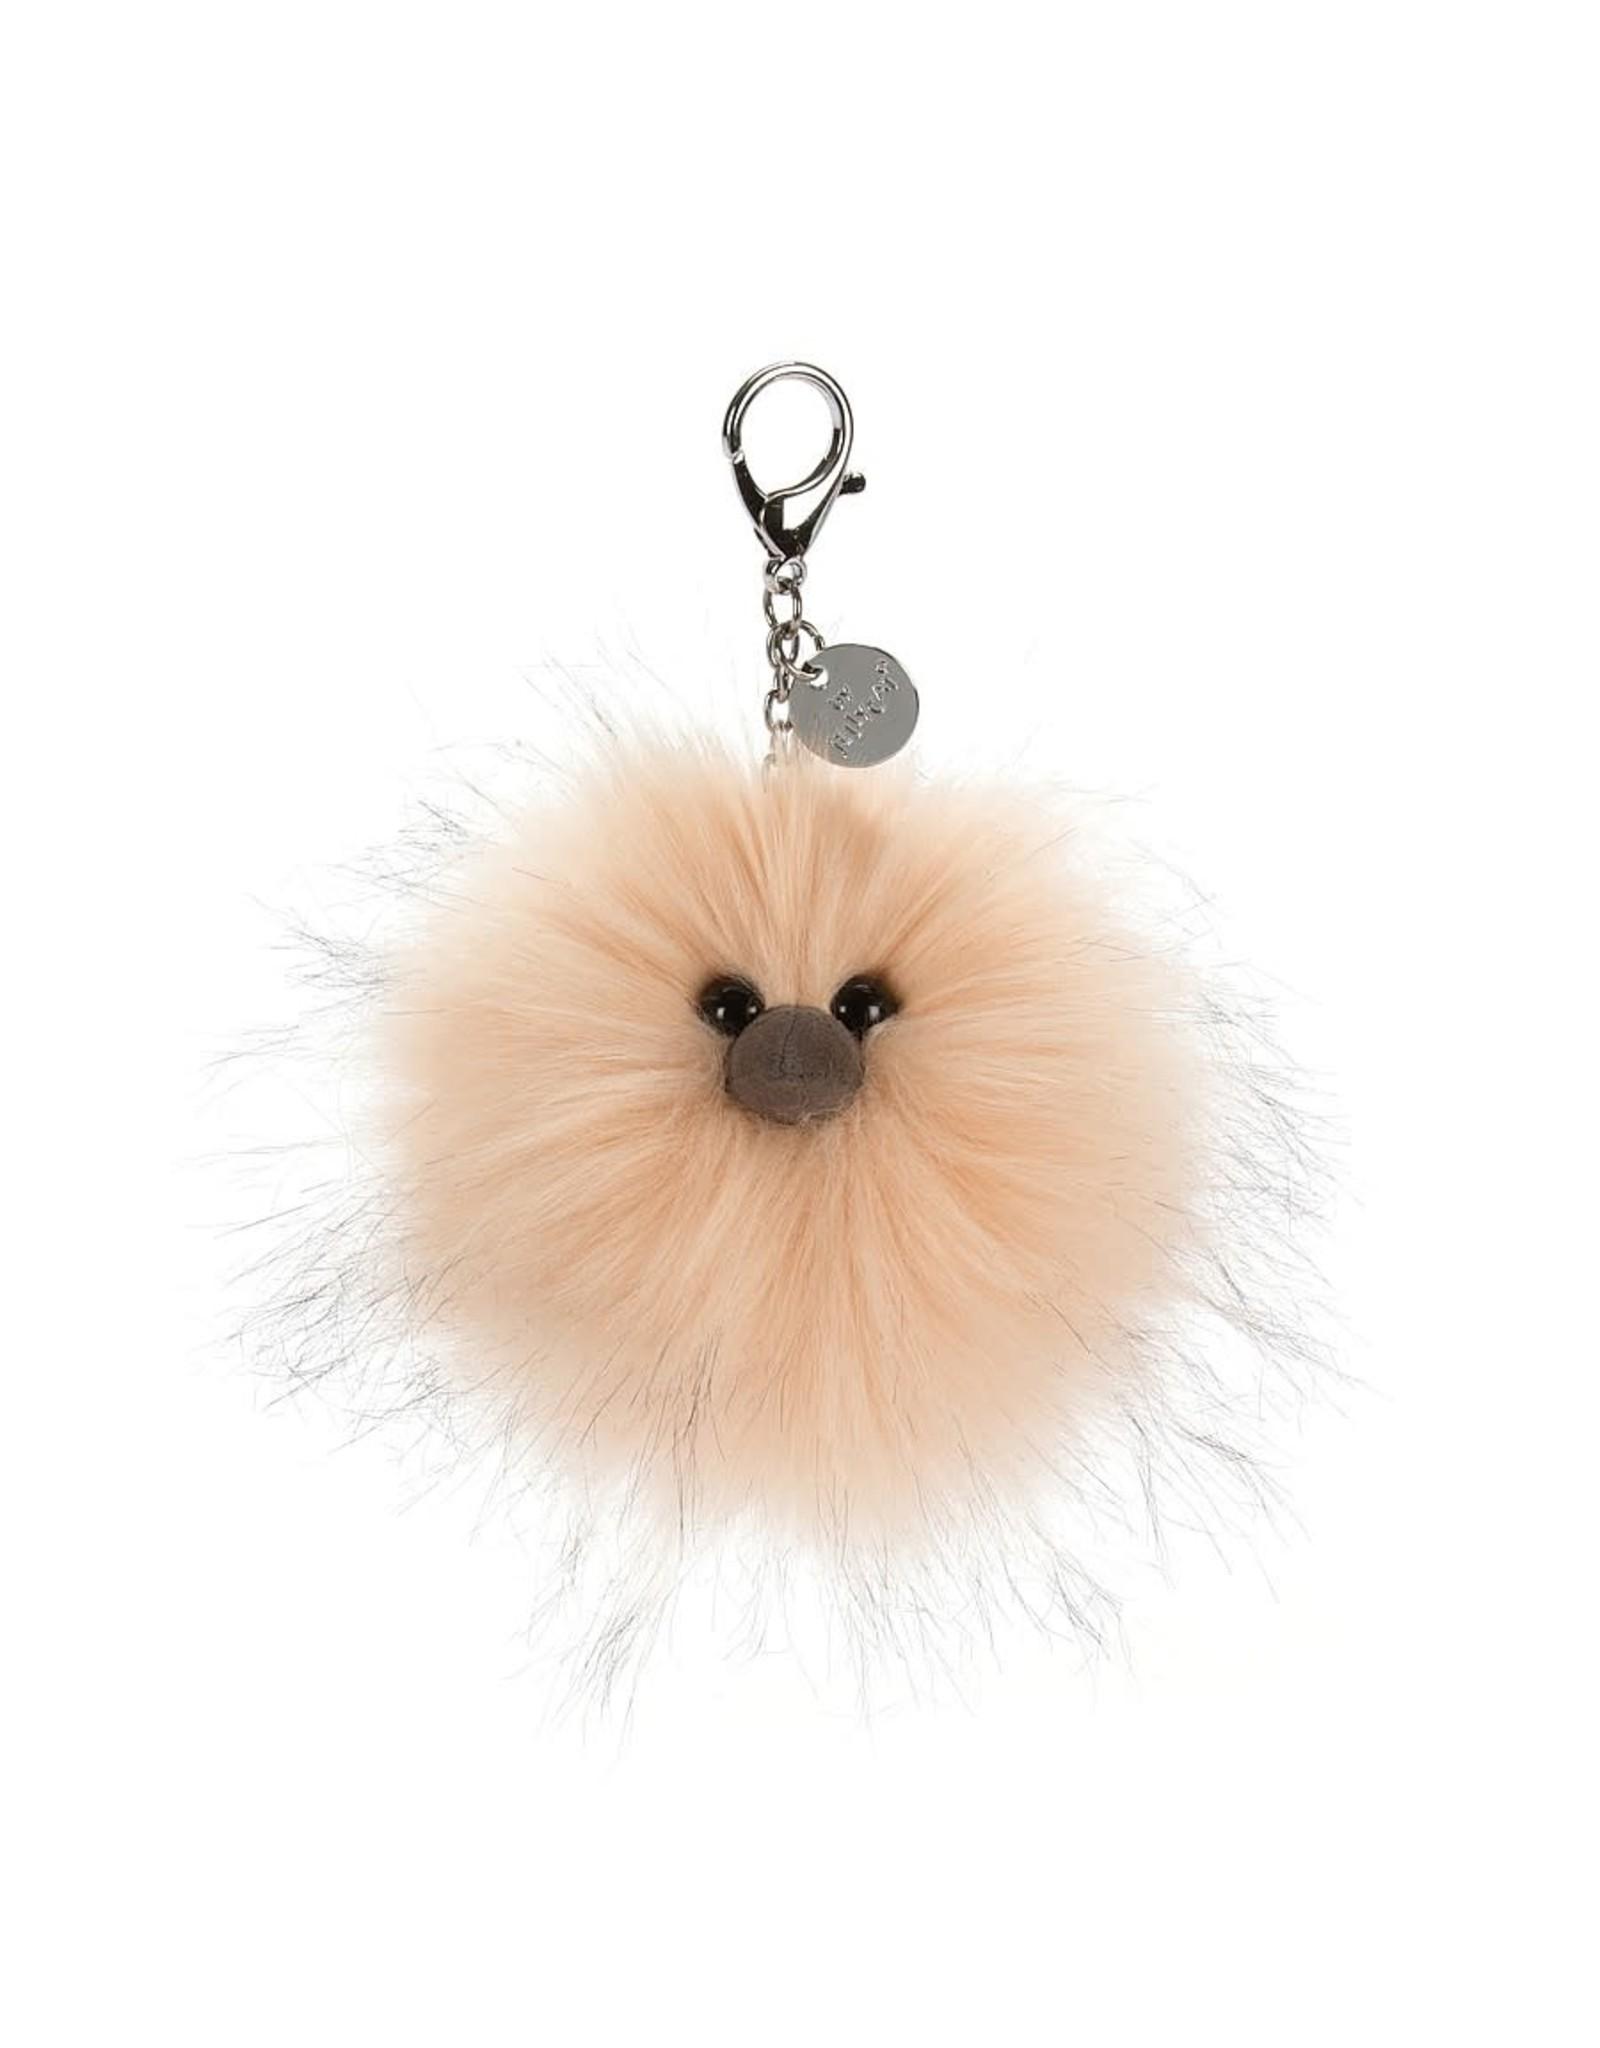 Jellycat Just Peachy Pom Bag Charm